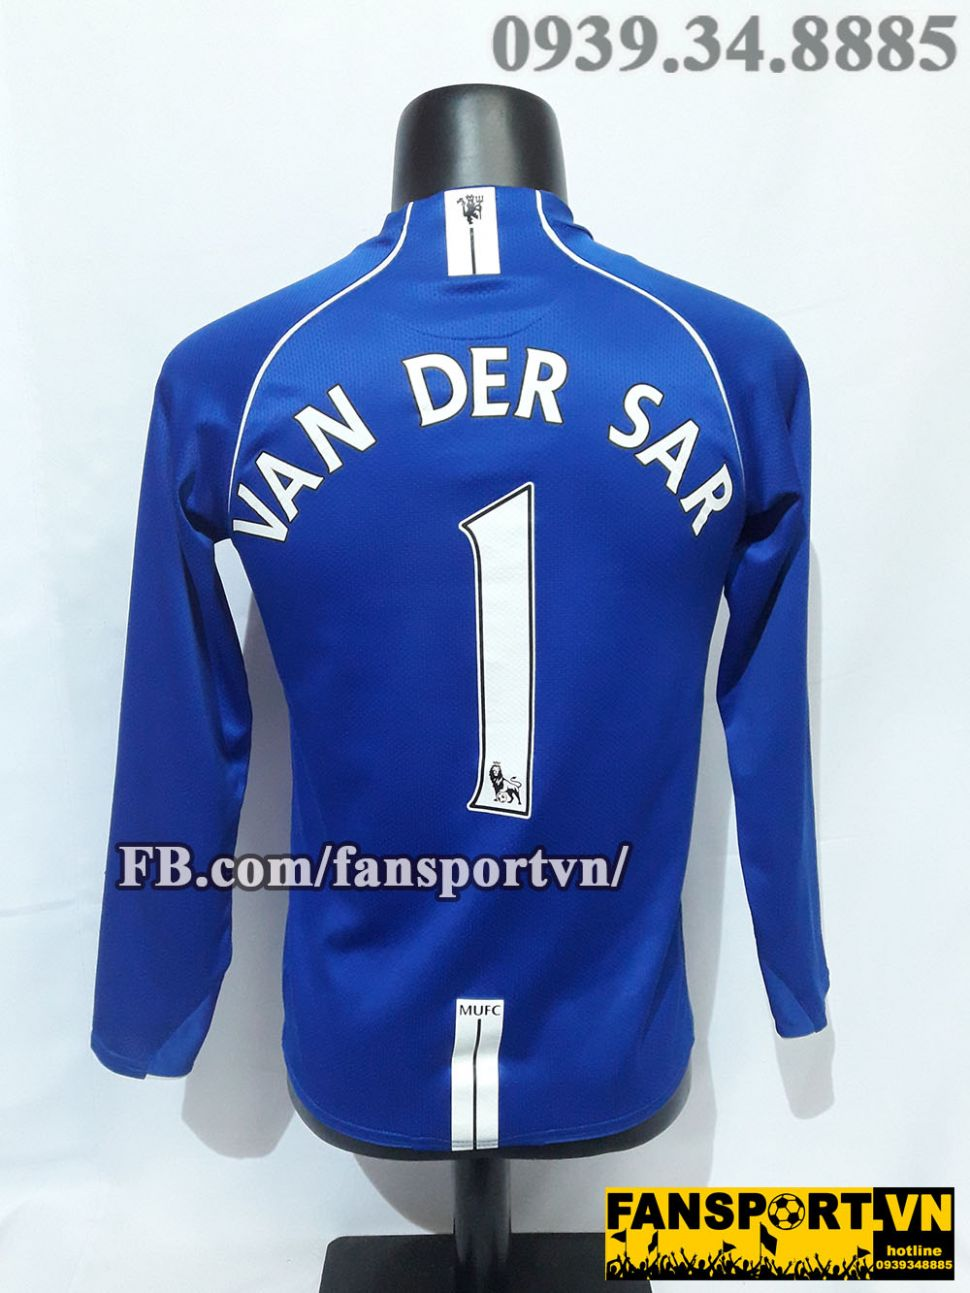 Áo Van Der Sar #1 Manchester United 2007-2008 home goalkeeper shirt GK